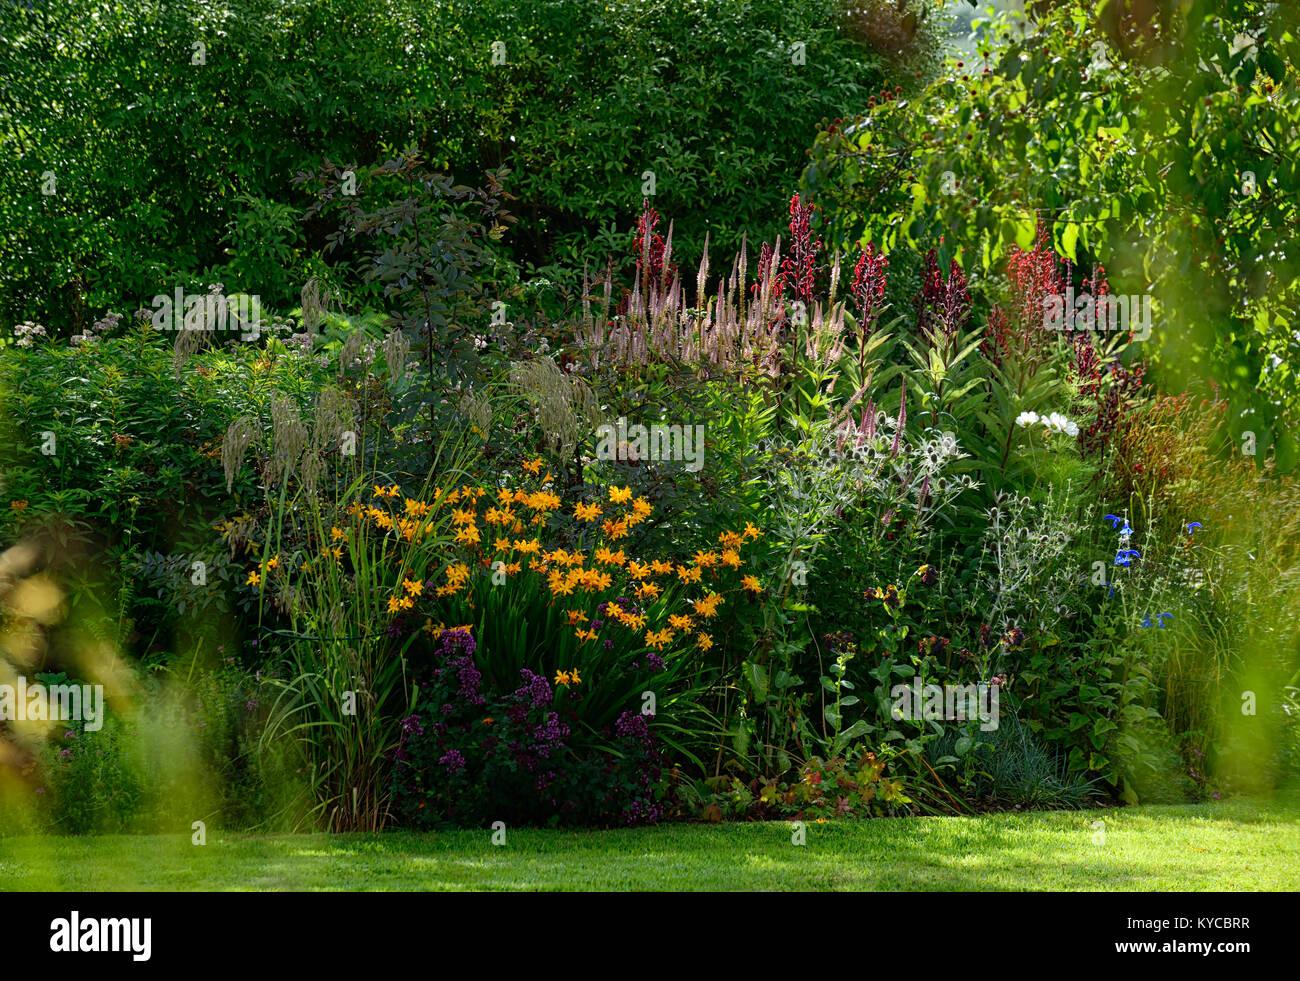 Crocosmia x crocosmiiflora Buttercup,veronicastrum virginicum,lobelia tupa,yellow,pink,red,flower,flowers,spire,spires,spike,spikes,garden,gardens,RM - Stock Image